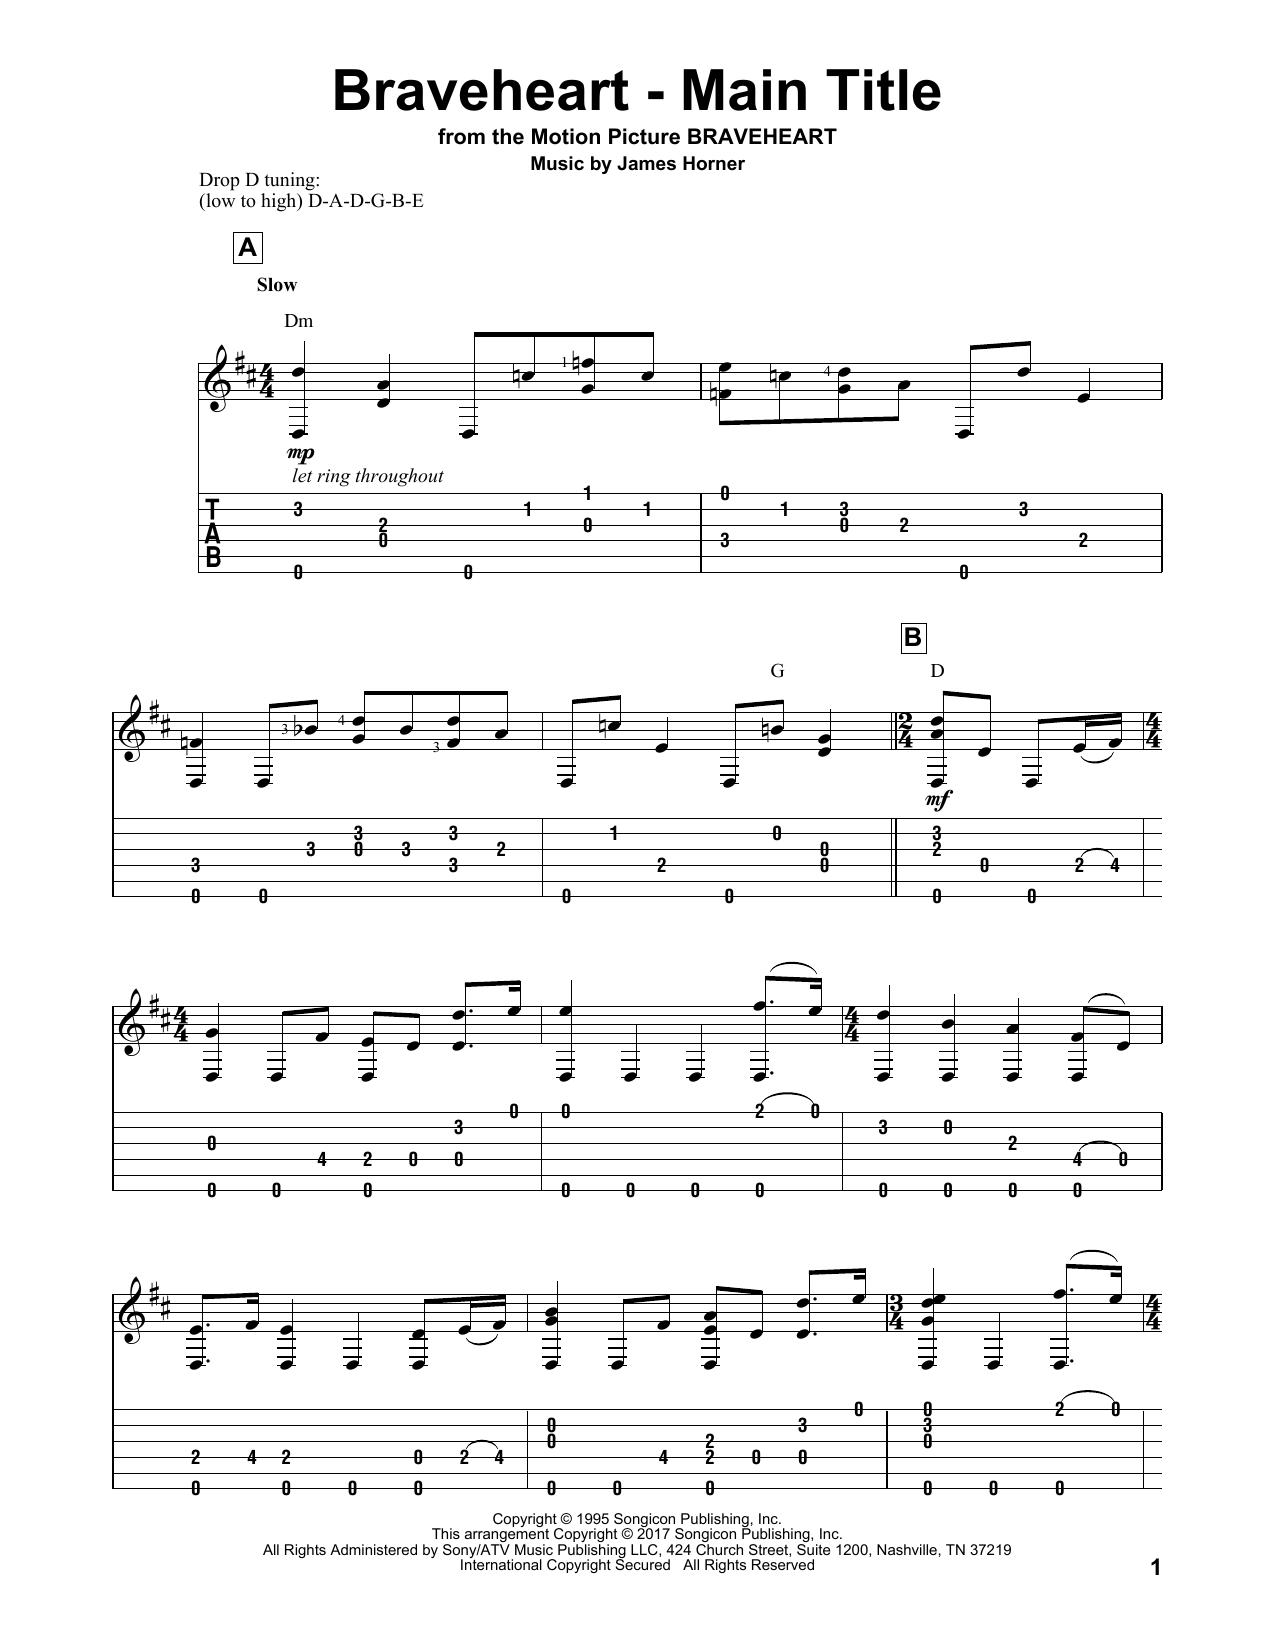 Braveheart main title sheet music at stantons sheet music format guitar solo hexwebz Choice Image